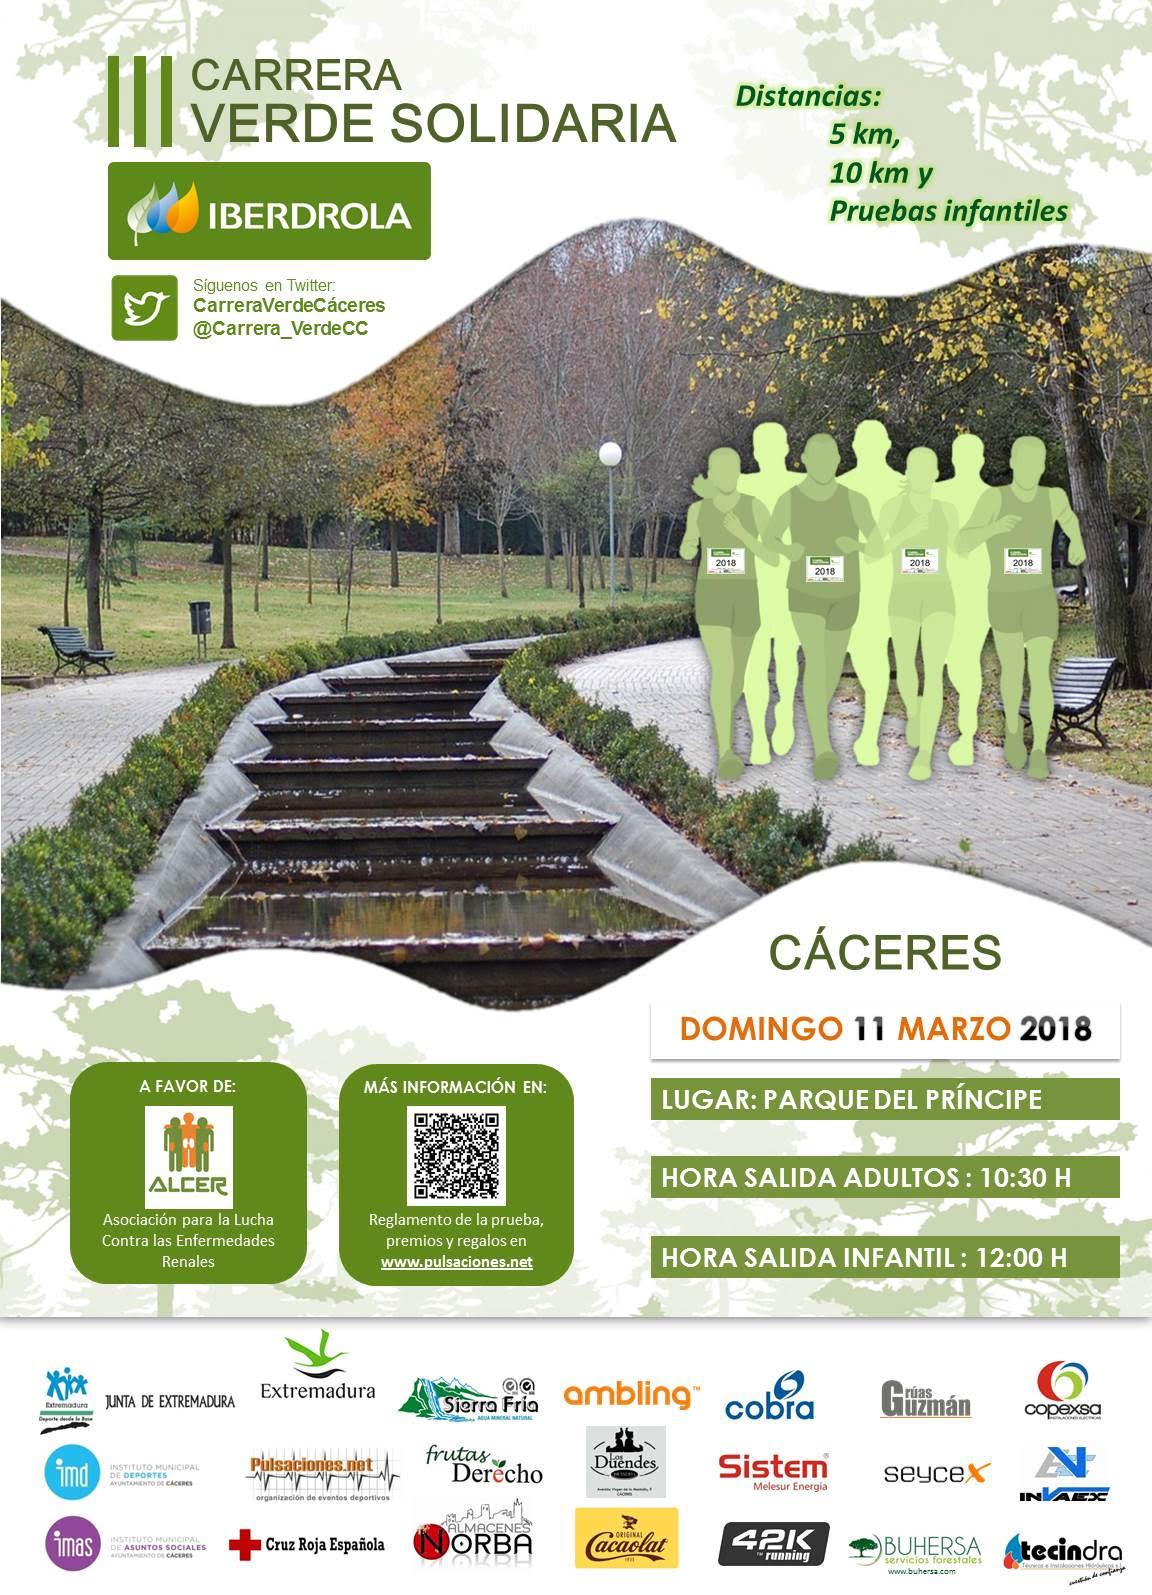 III Carrera Verde Solidaria Iberdrola